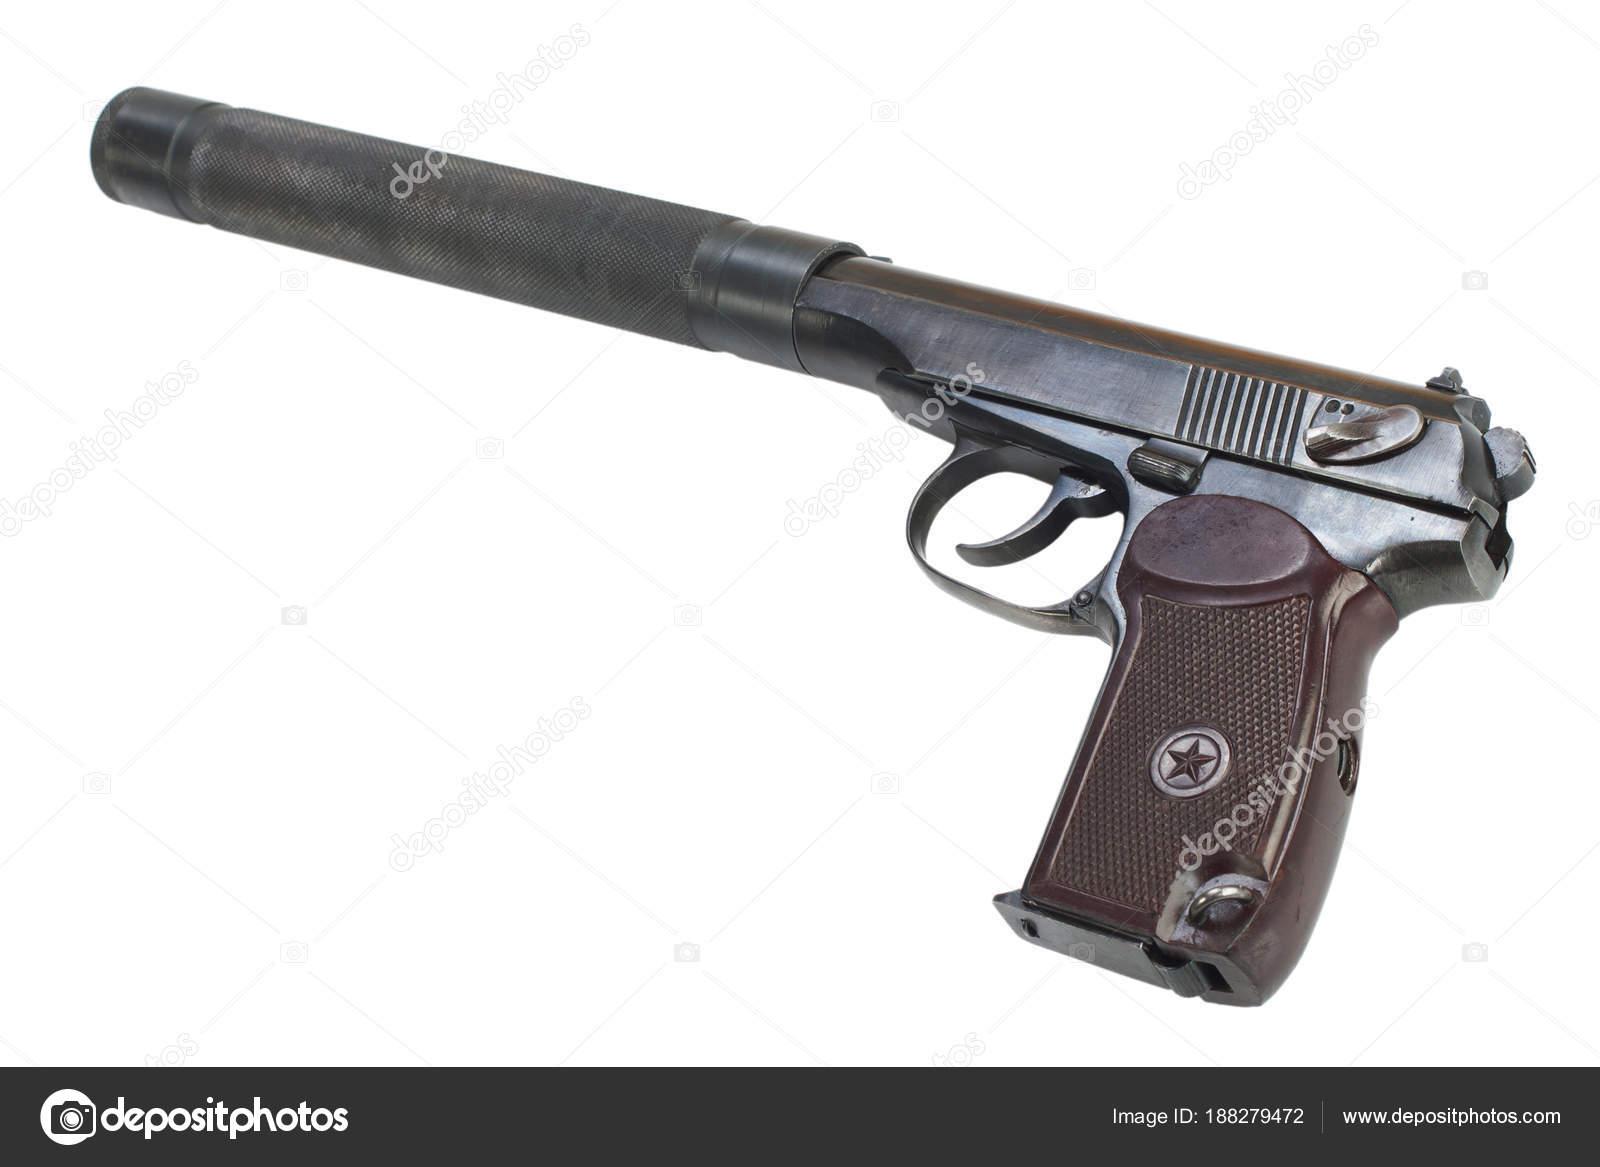 ussr makarov pistol silencer isolated stock photo zim90 188279472